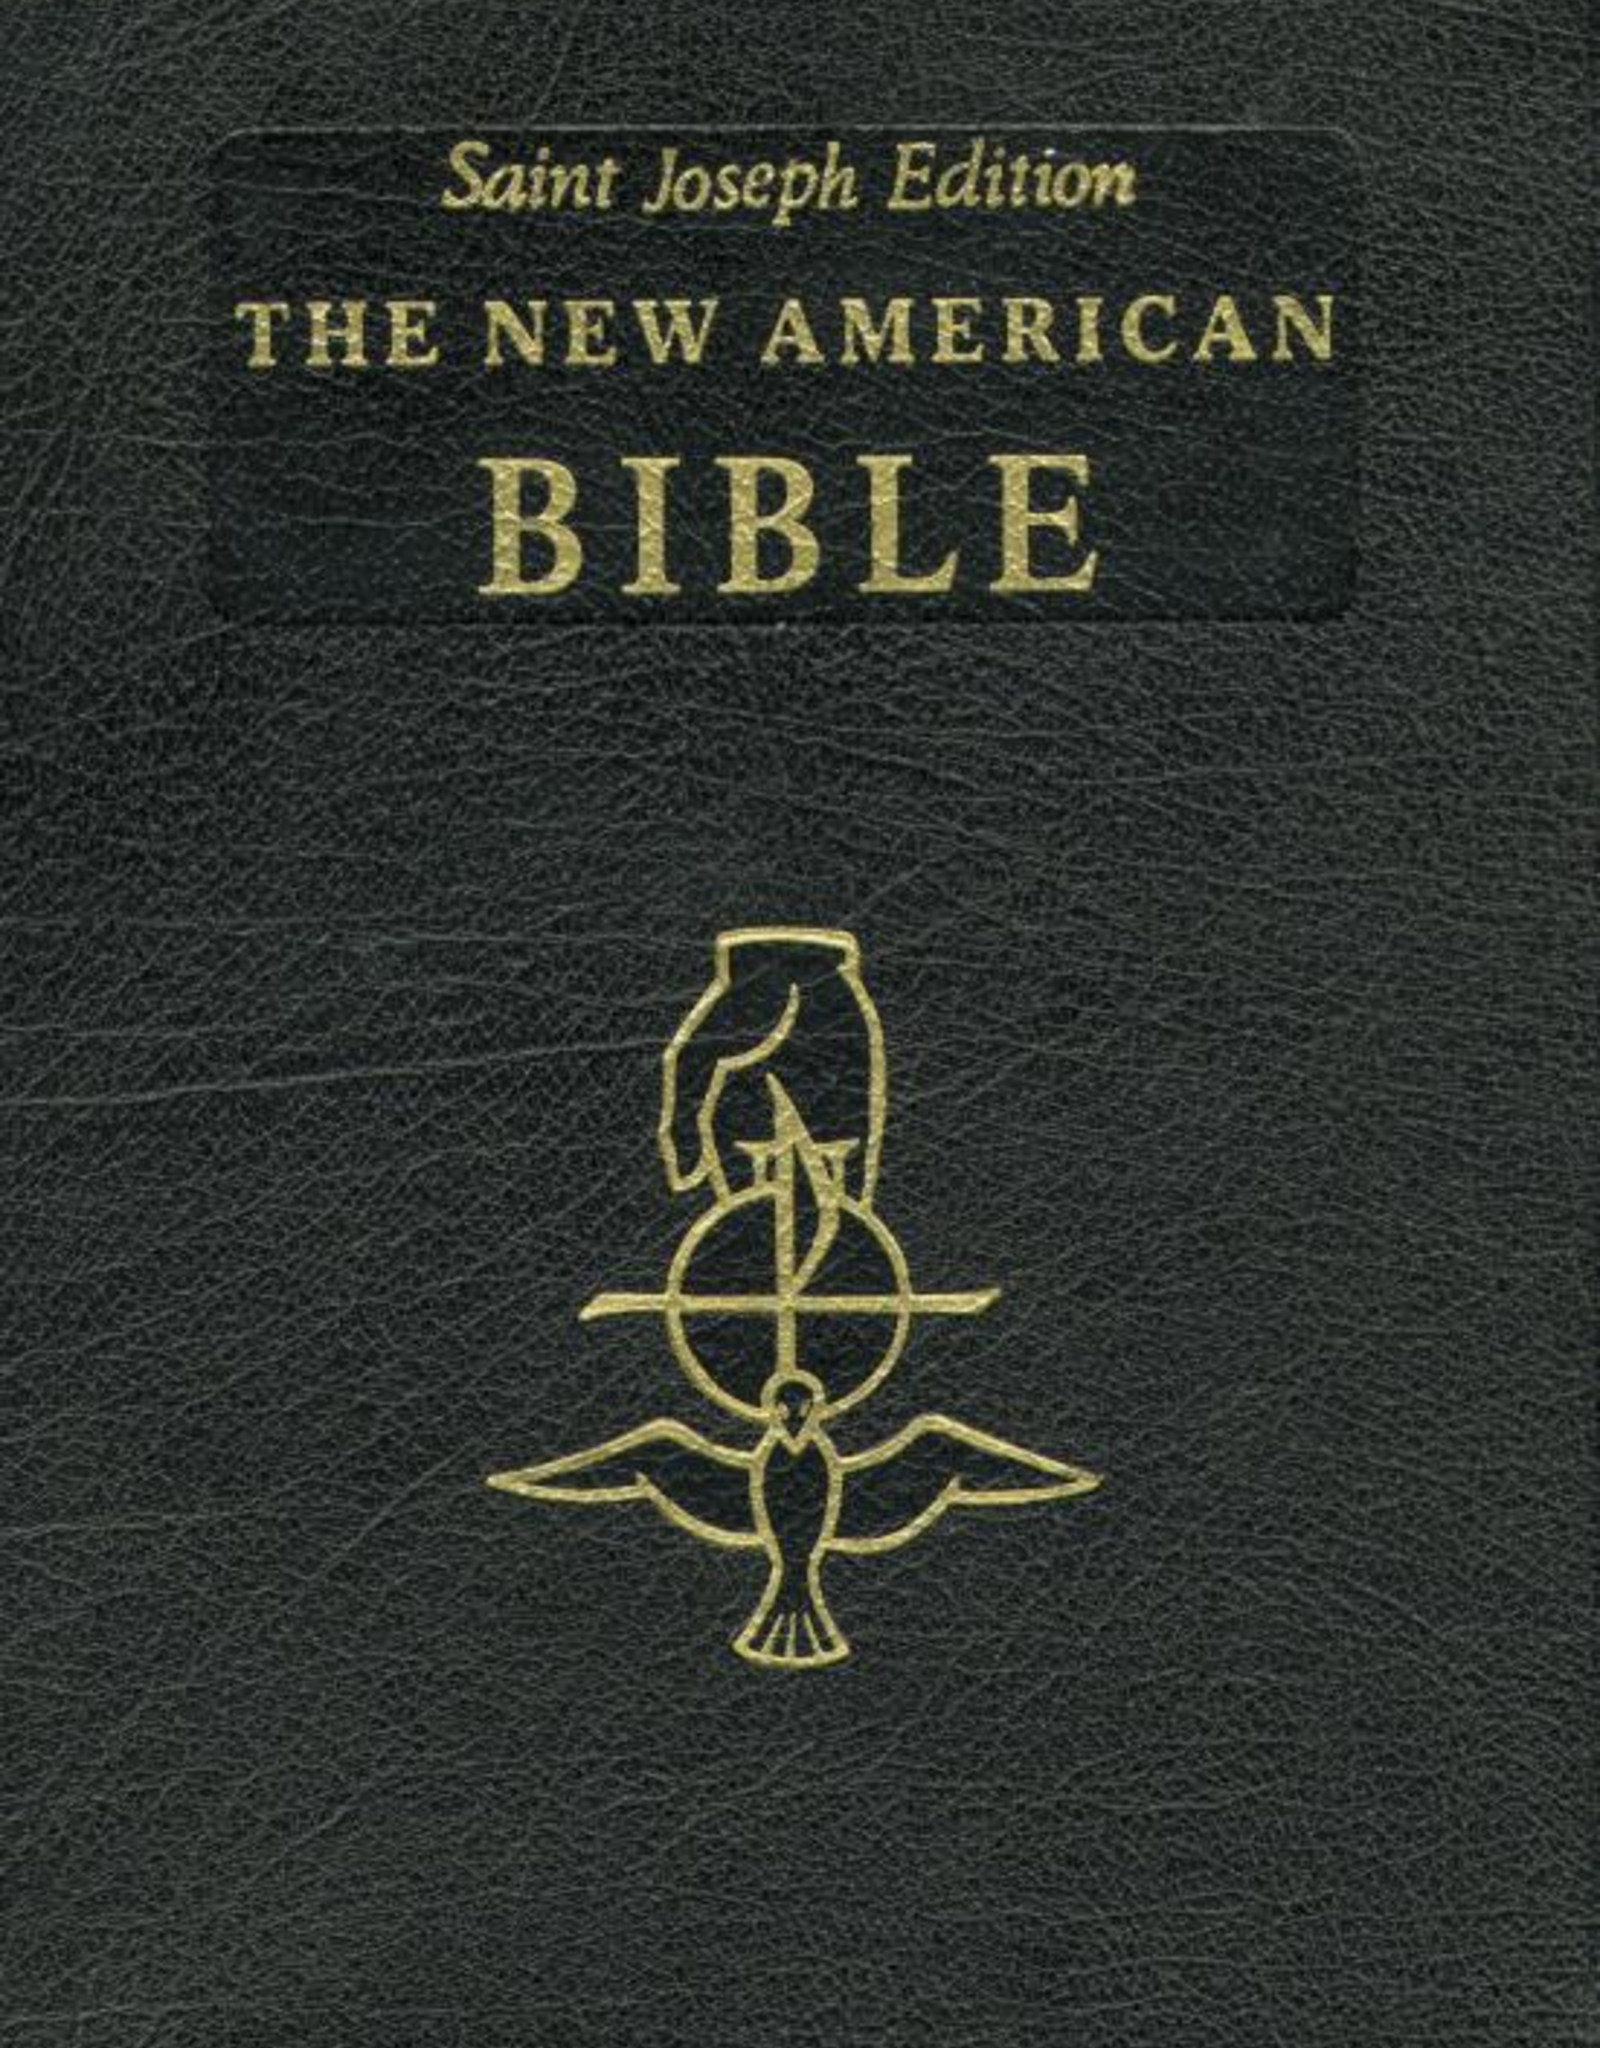 Catholic Book Publishing Full Size St. Joseph's Edition New American Bible, Black Bonded Leather Edition